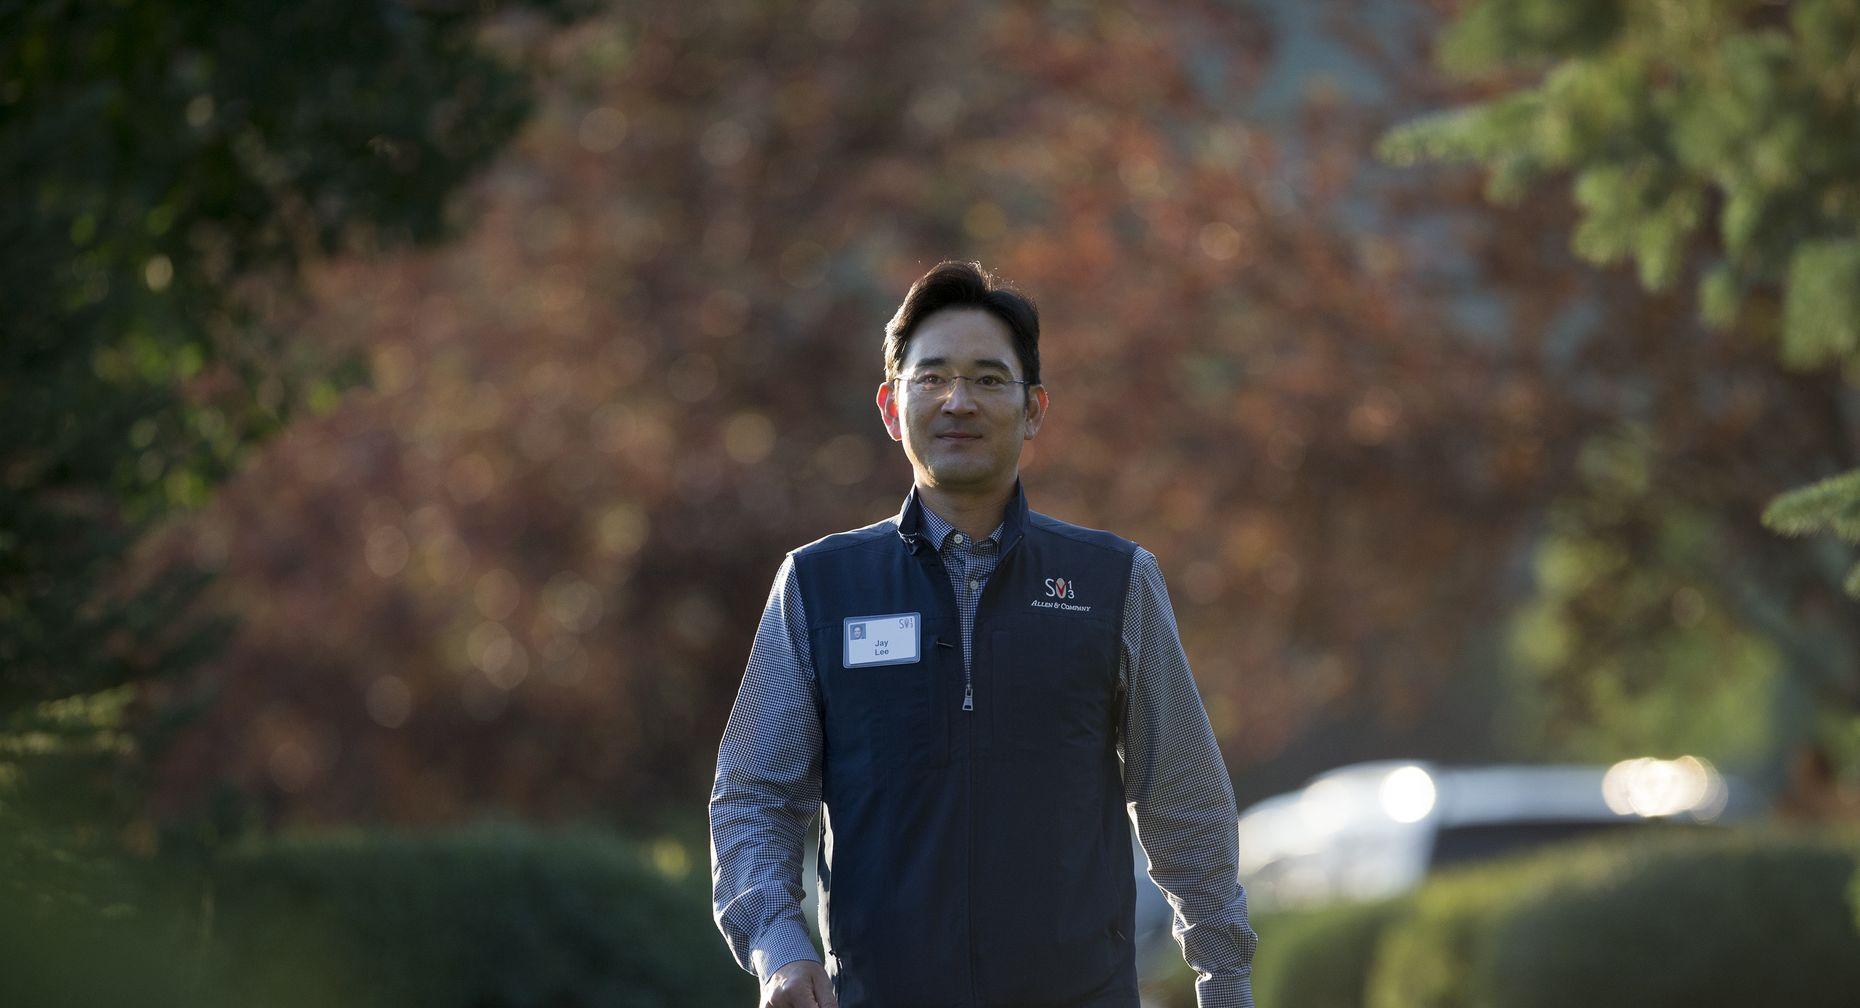 Smartwatches Drive New Wedge Between Samsung, Google